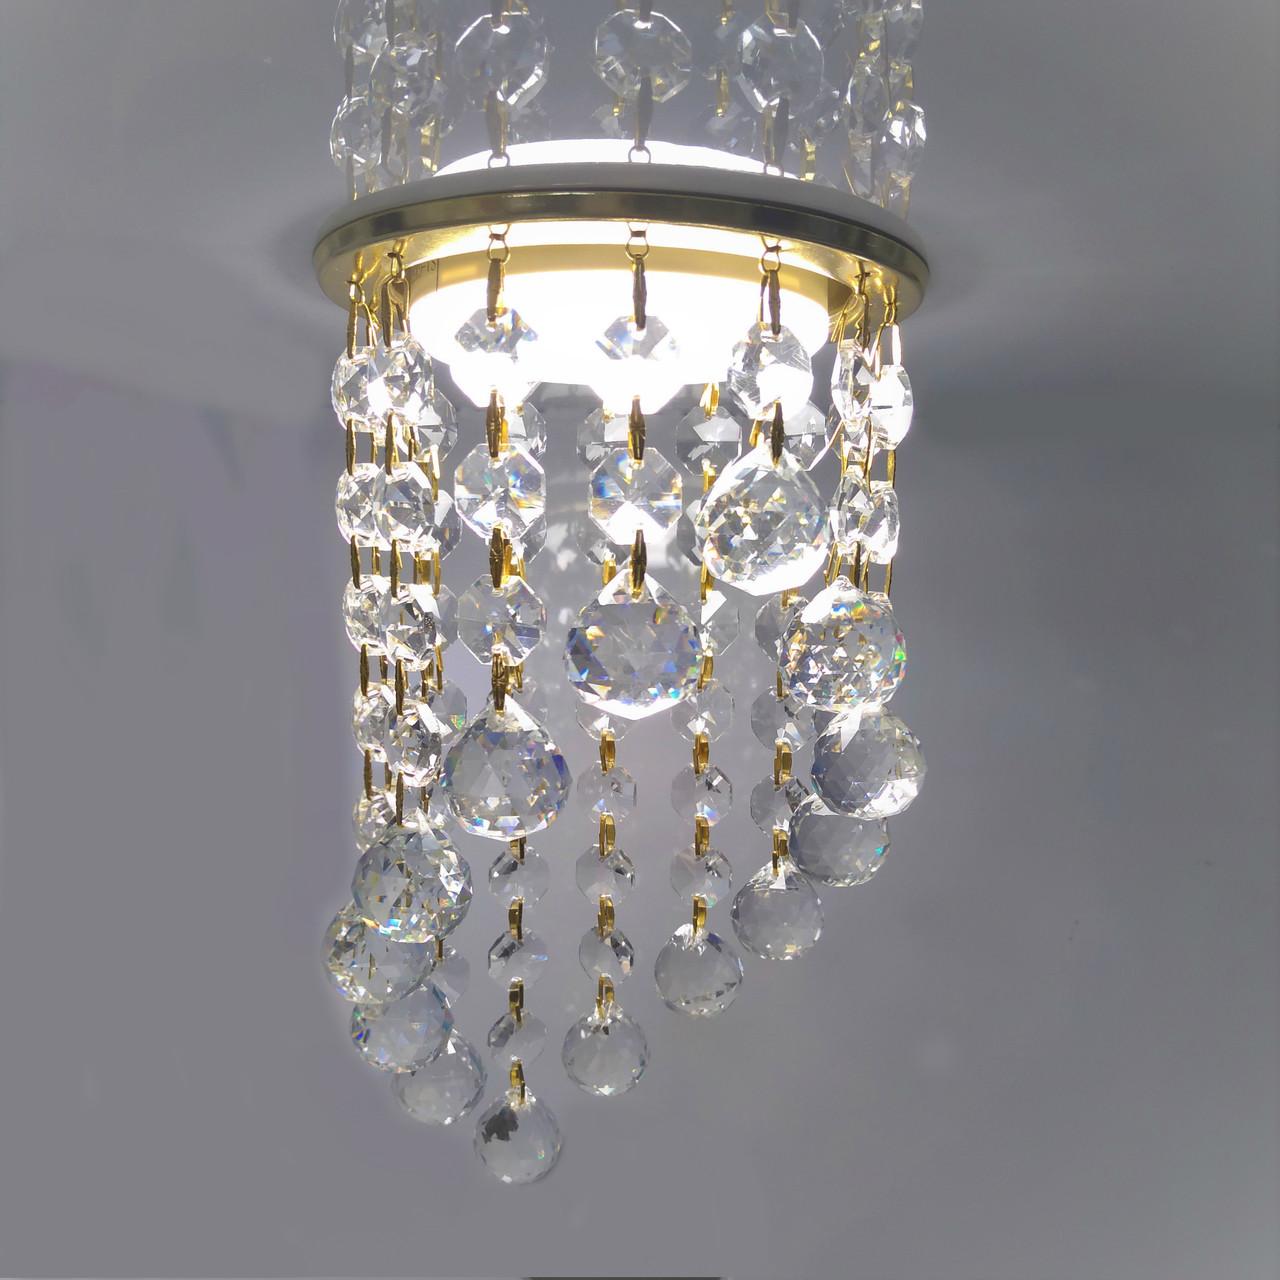 Светильник GX53 L 129 золото